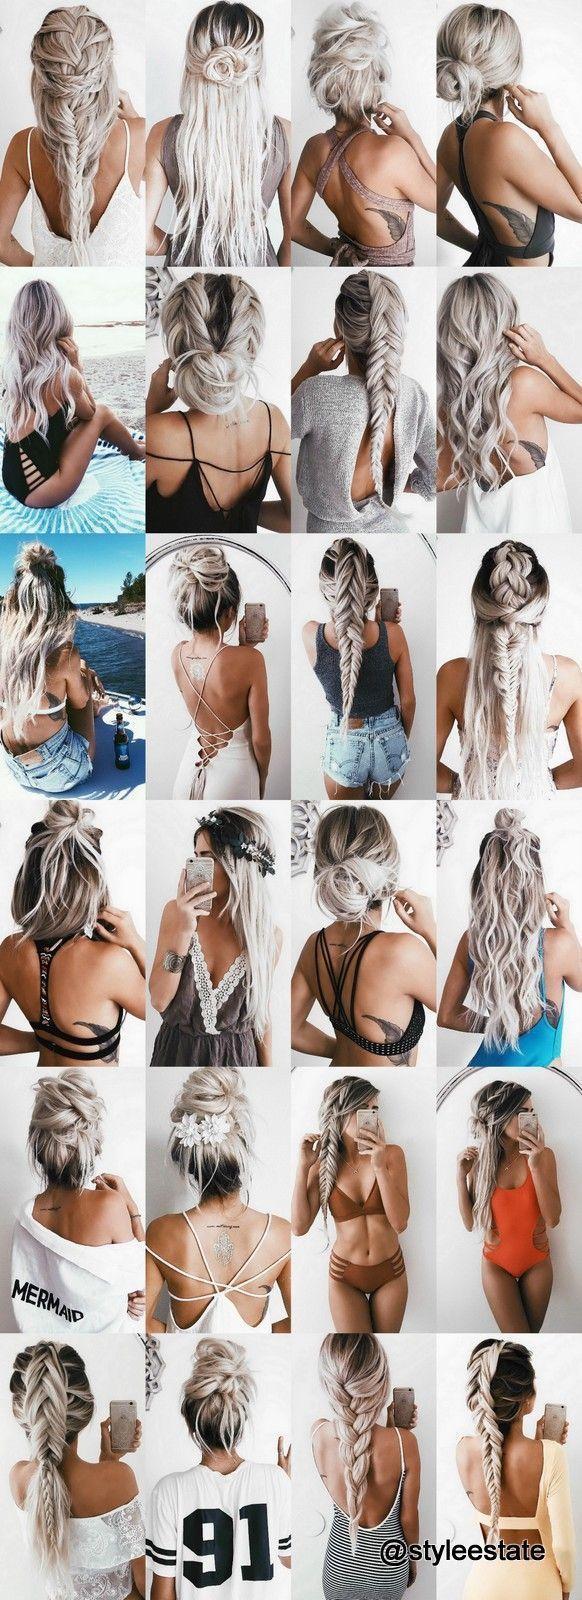 Photo of Blonde IG Model Emily Hannon's Top 24 Hairstyles – frisuren modelle 2019